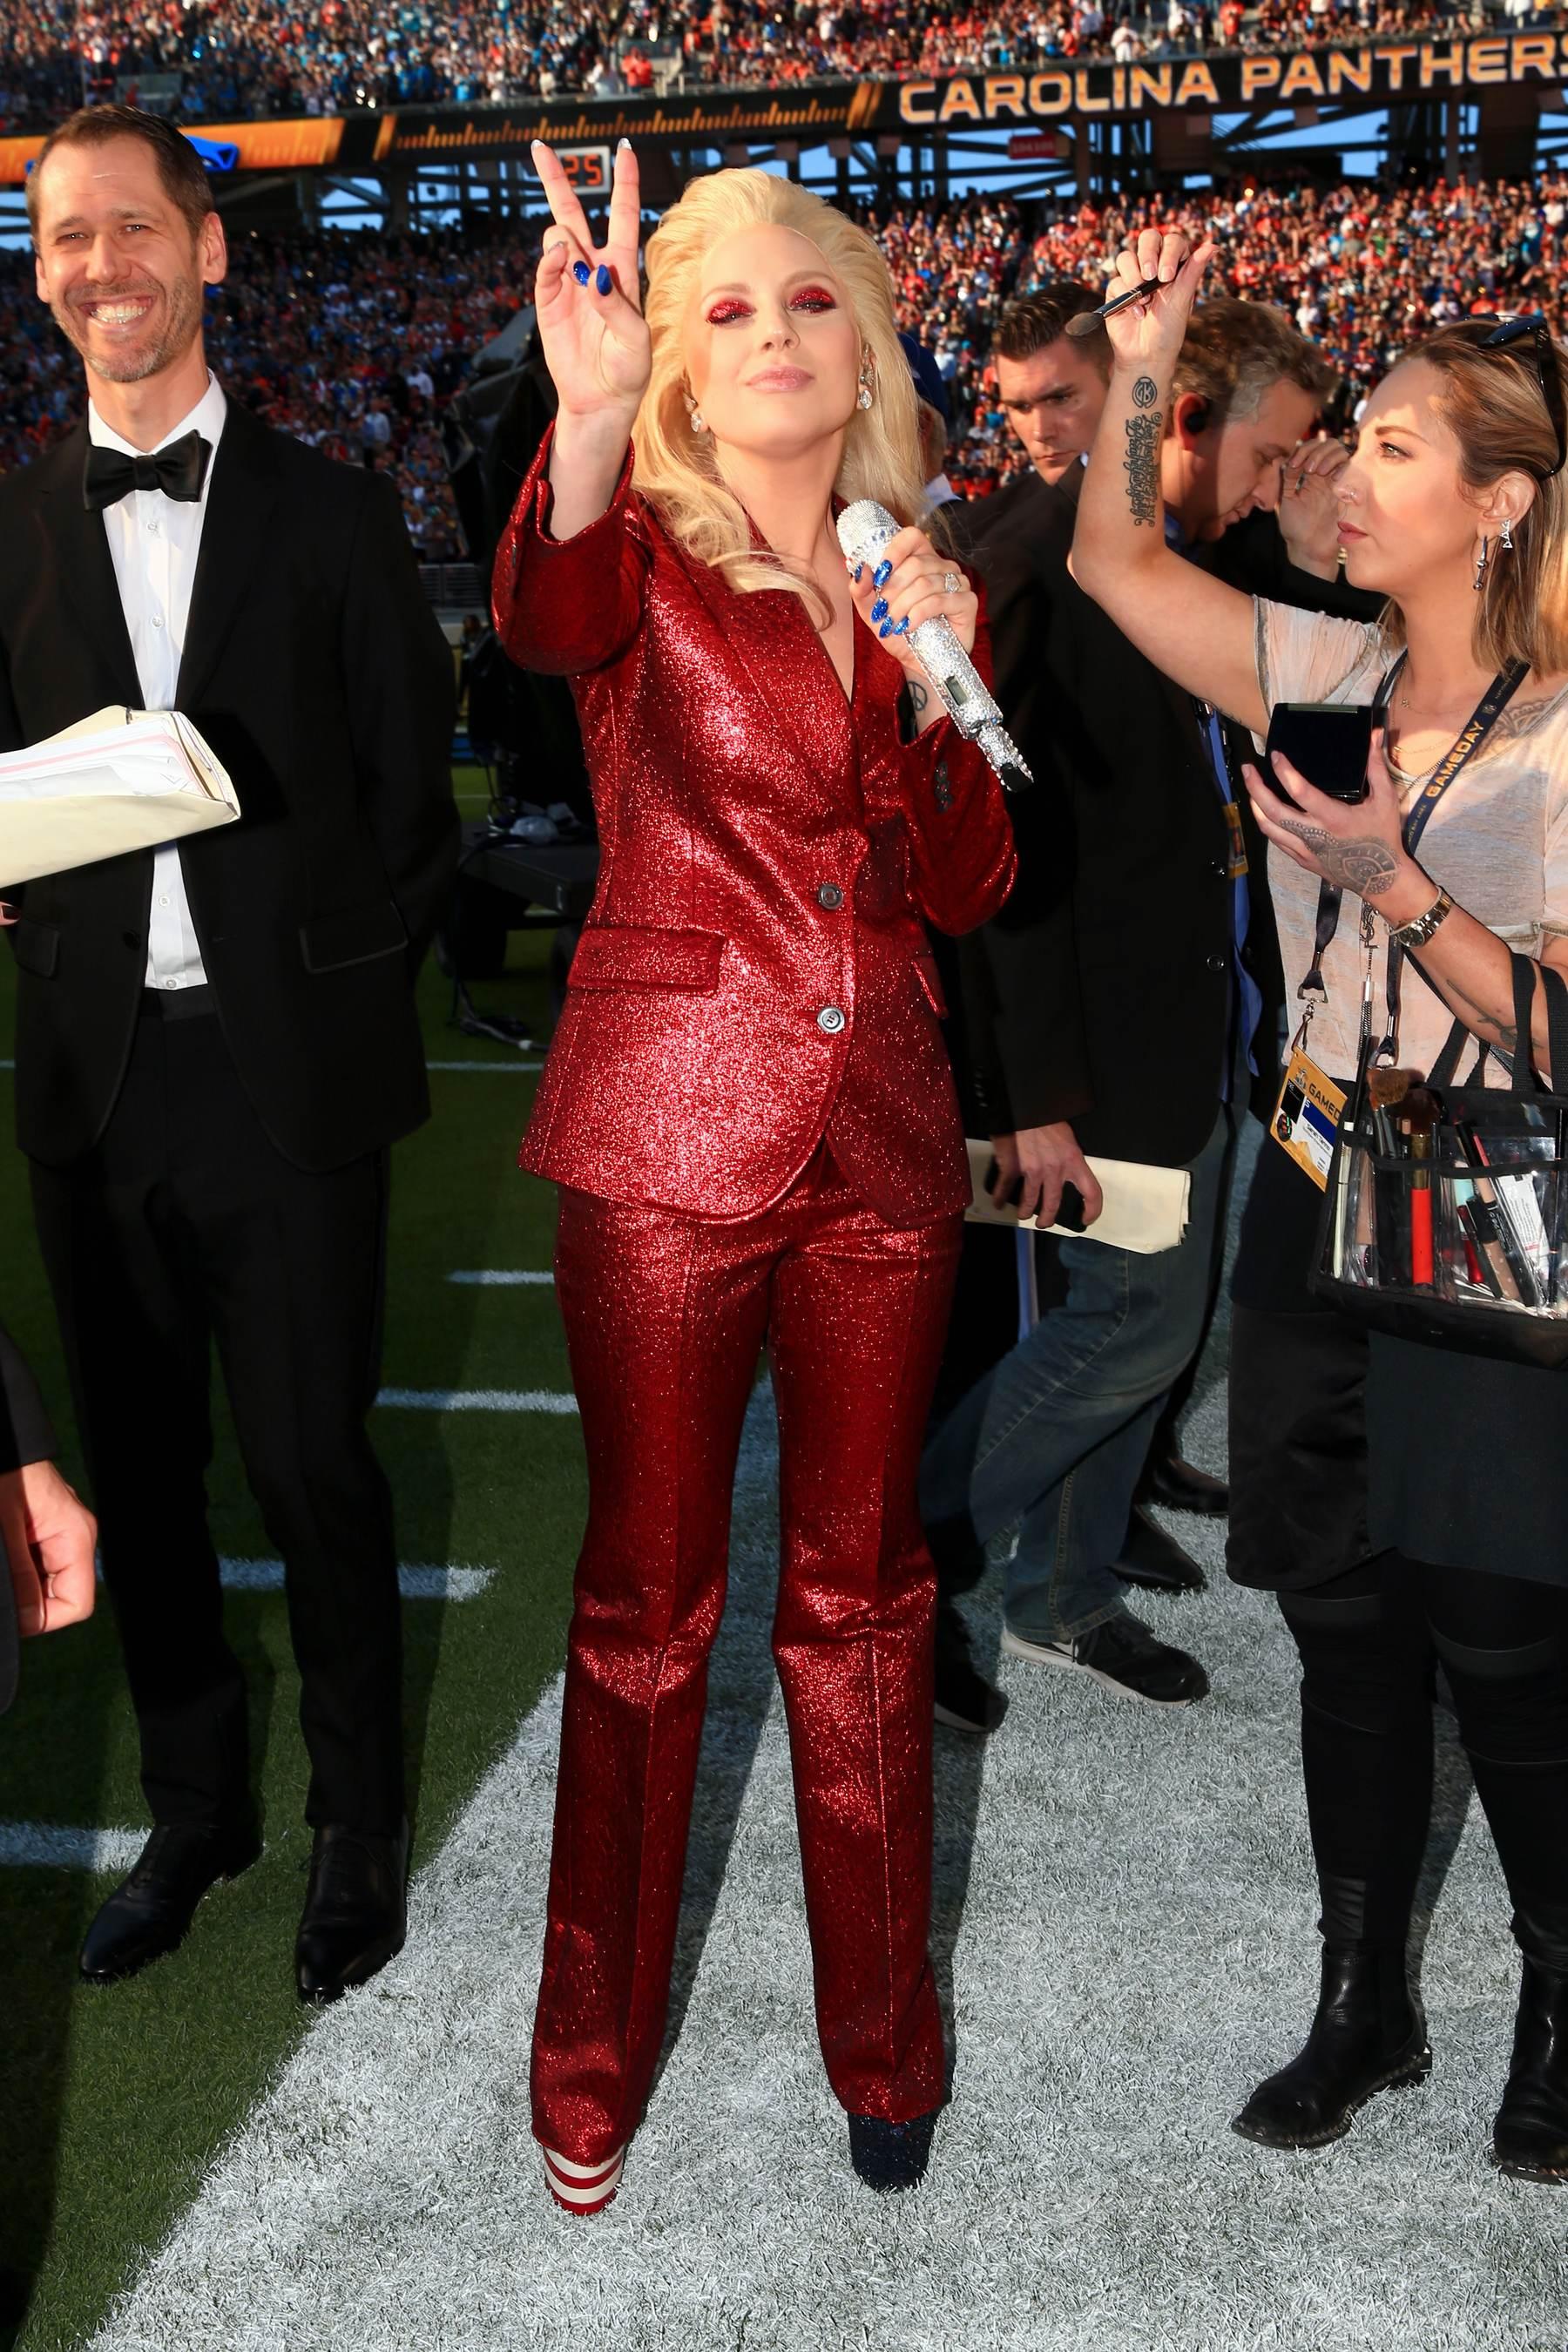 Lady Gaga singse National Anthem at Super Bowl - Celeb Donut